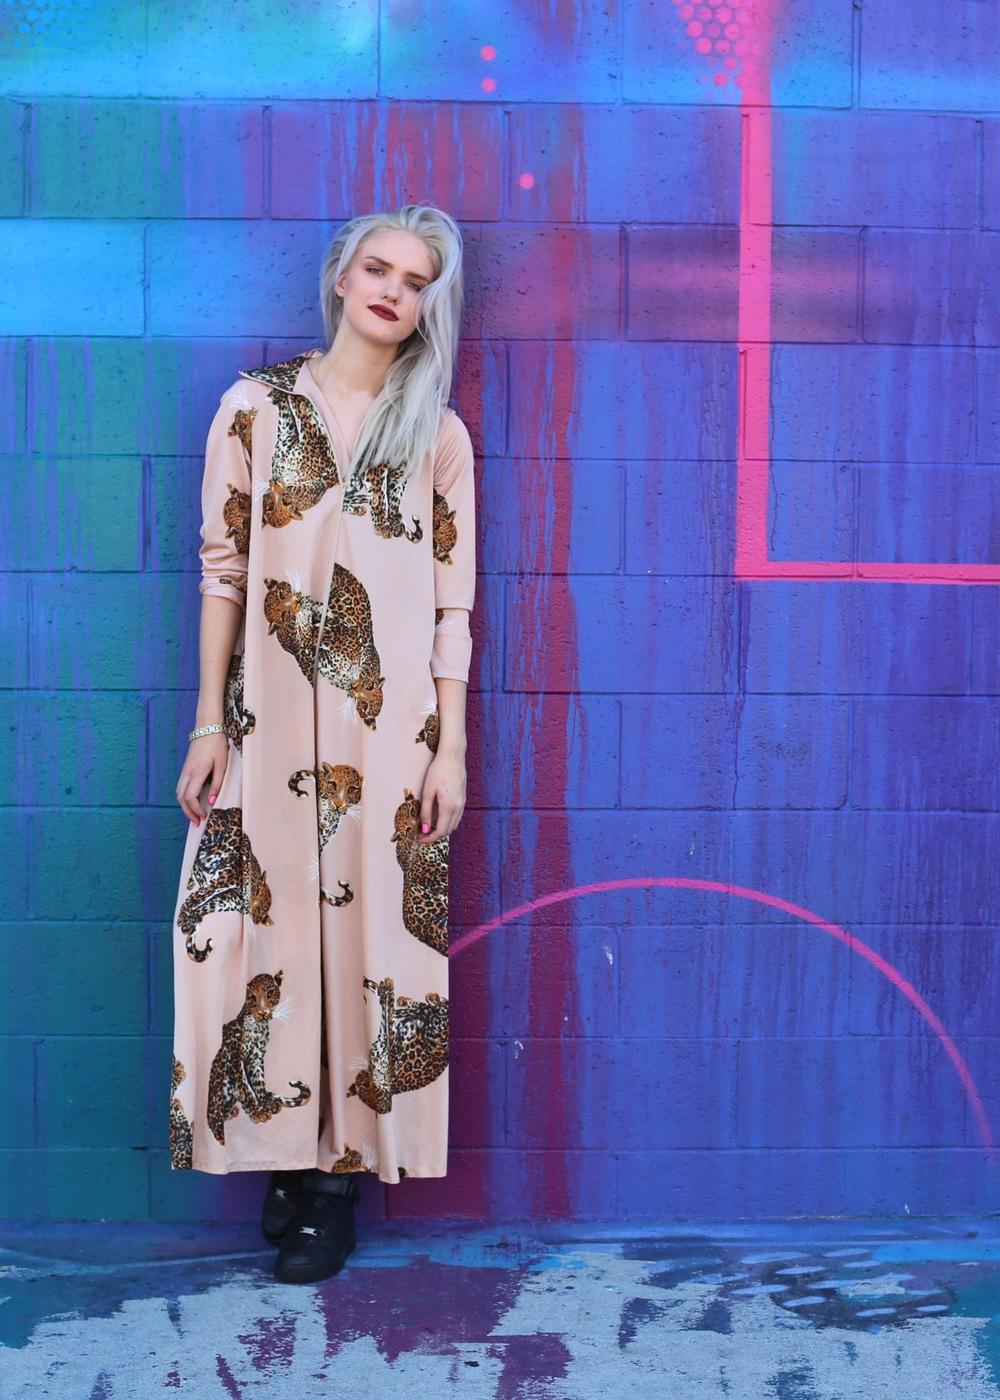 Heidi Hakkanen ( Fashion Student/Blogge r)  @SleeplessinSuburbia  www.PostSuburbia.com  --  Downtown LA  Los Angeles, Ca